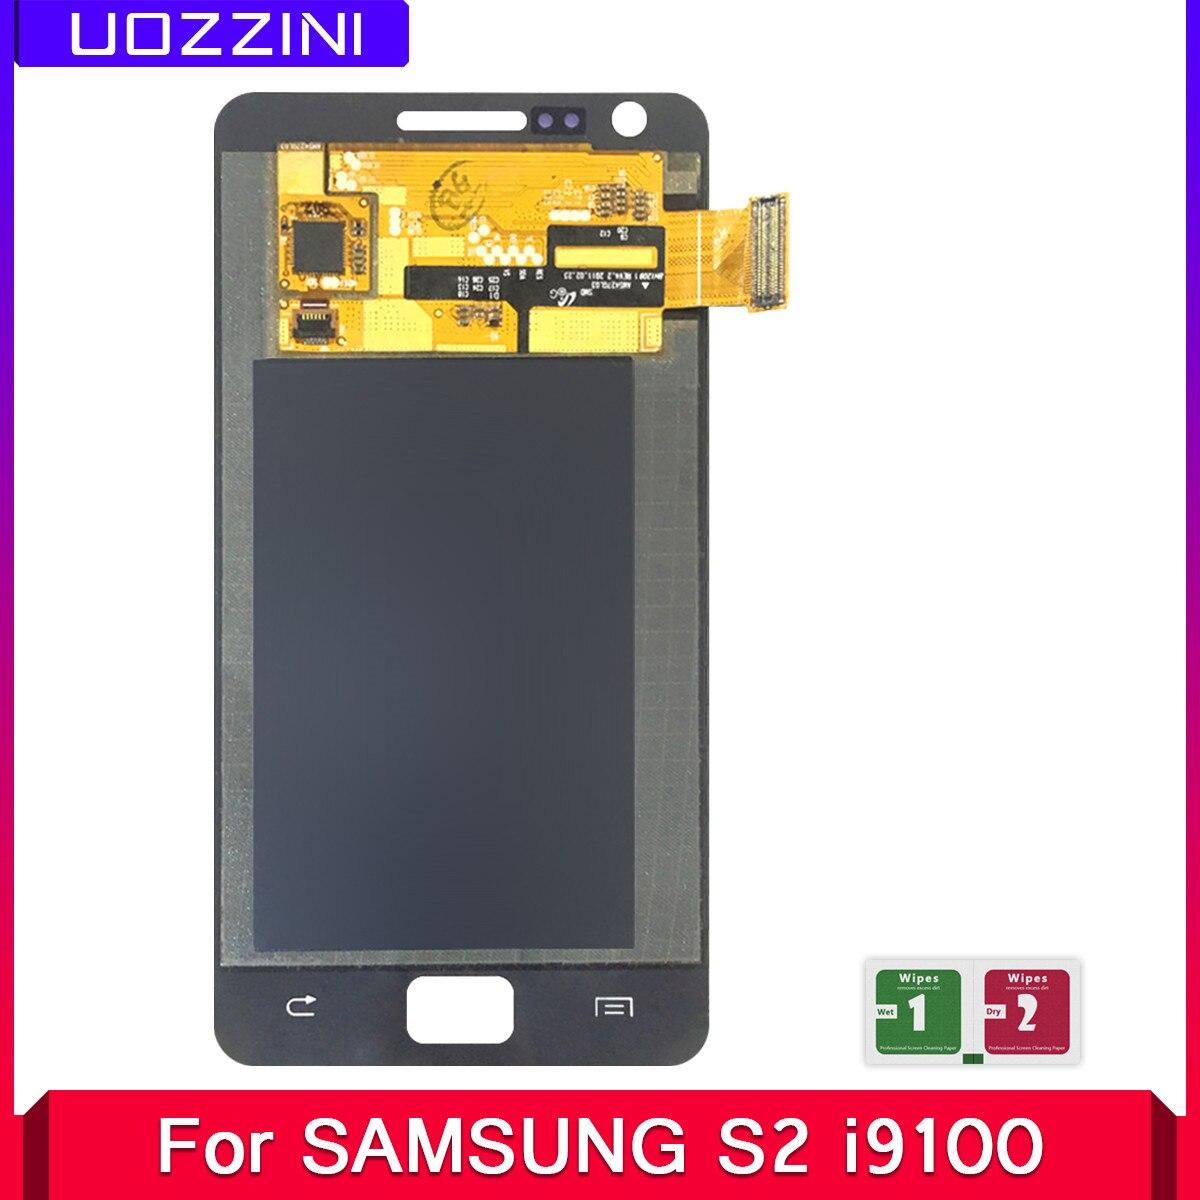 2 uds. Super AMOLED para samsung S2 I9100 I9105 pantalla LCD reemplazo para samsung i9105 i9100 pantalla lcd módulo